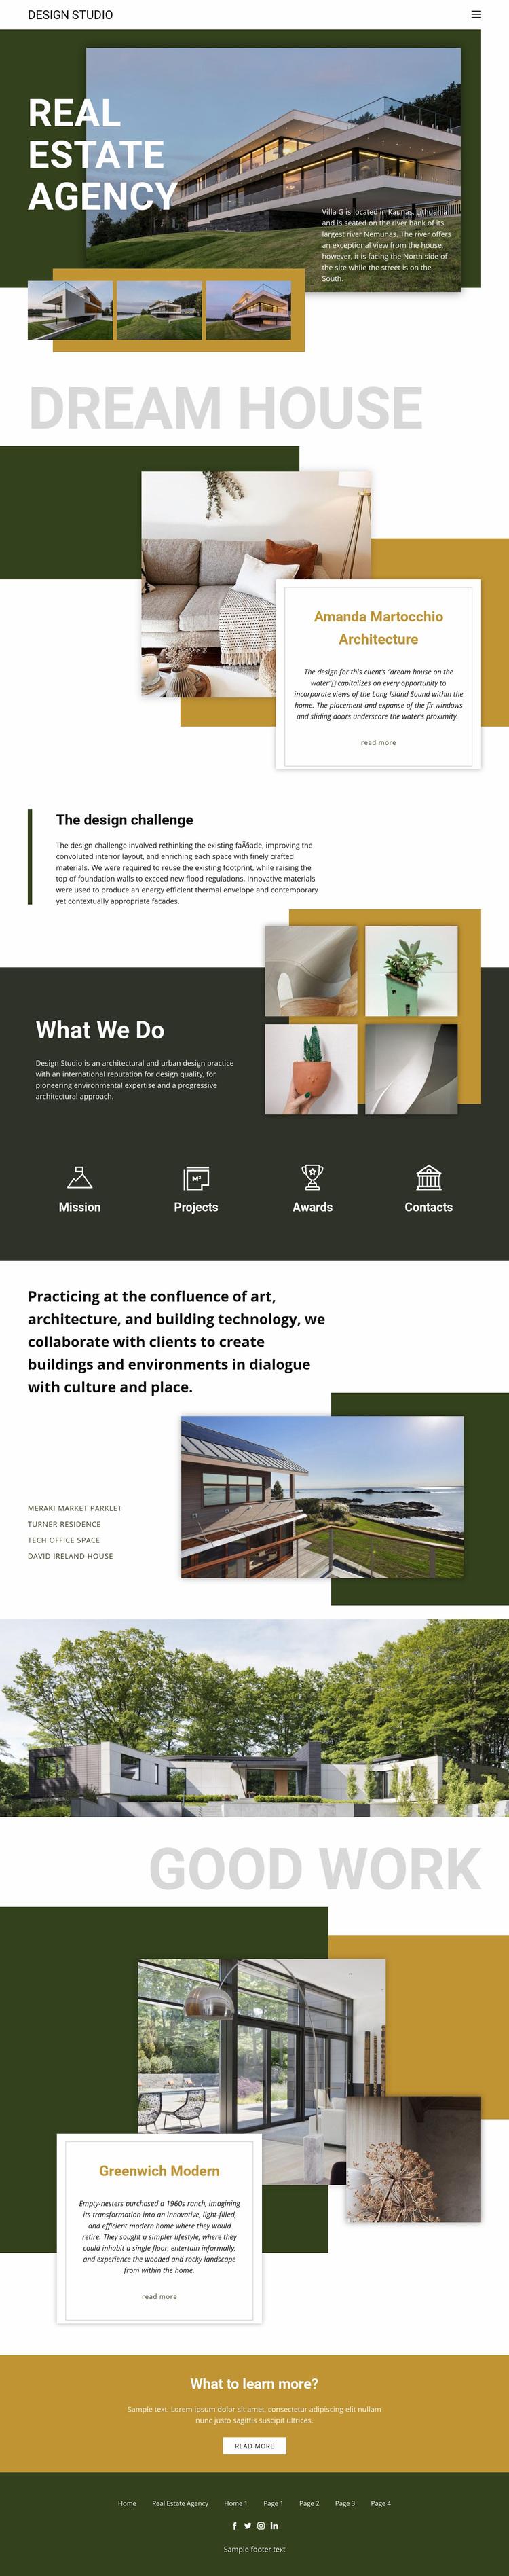 Dream real estate agency Web Page Designer